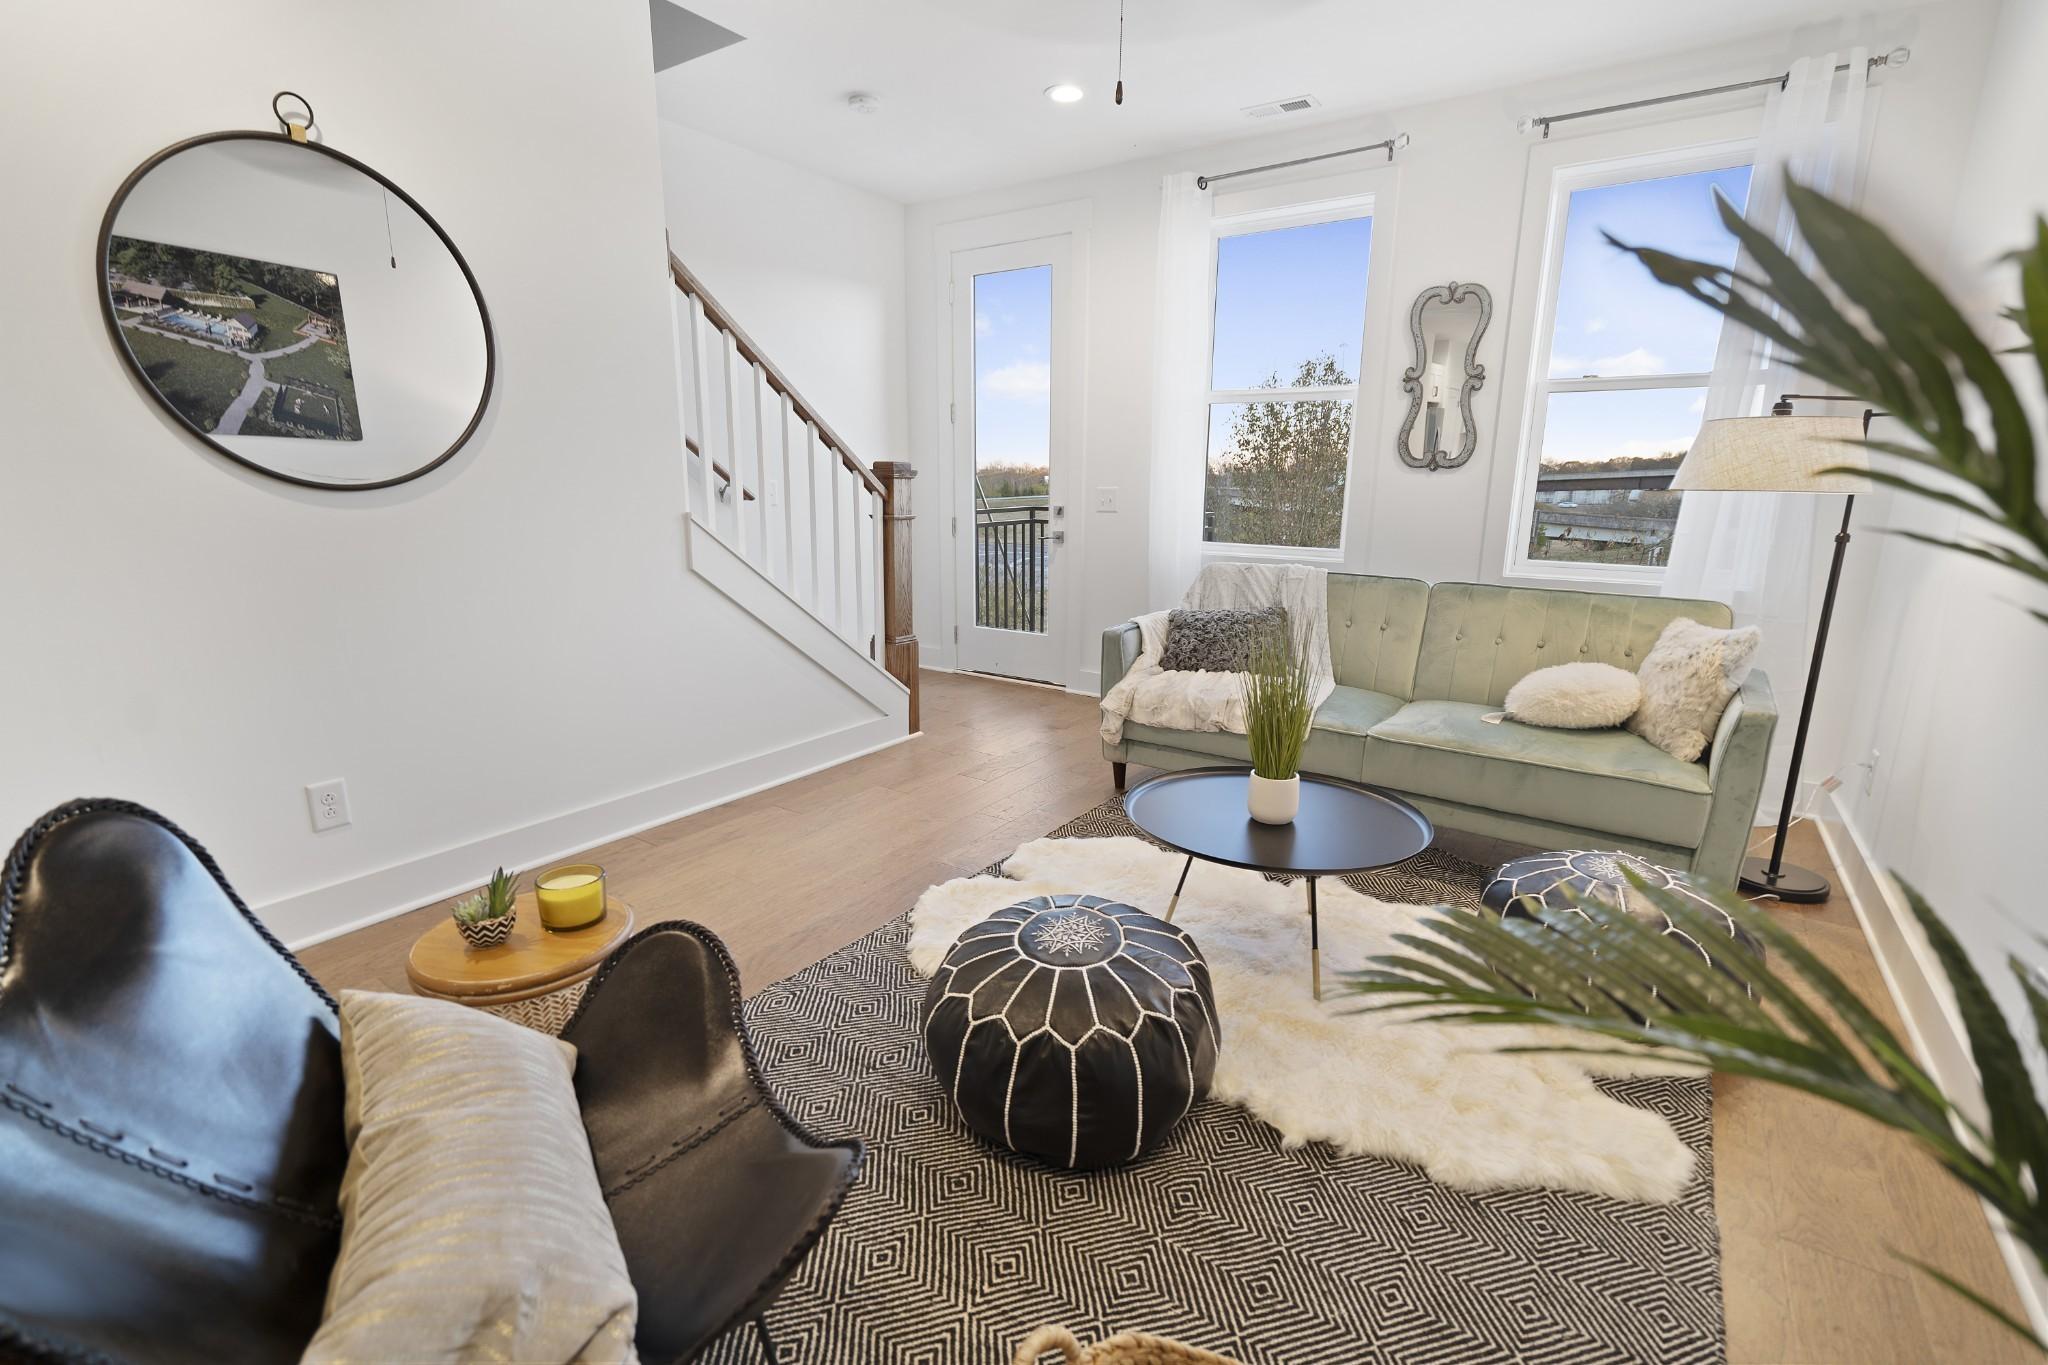 732 Inspiration Blvd #4 Property Photo - Madison, TN real estate listing